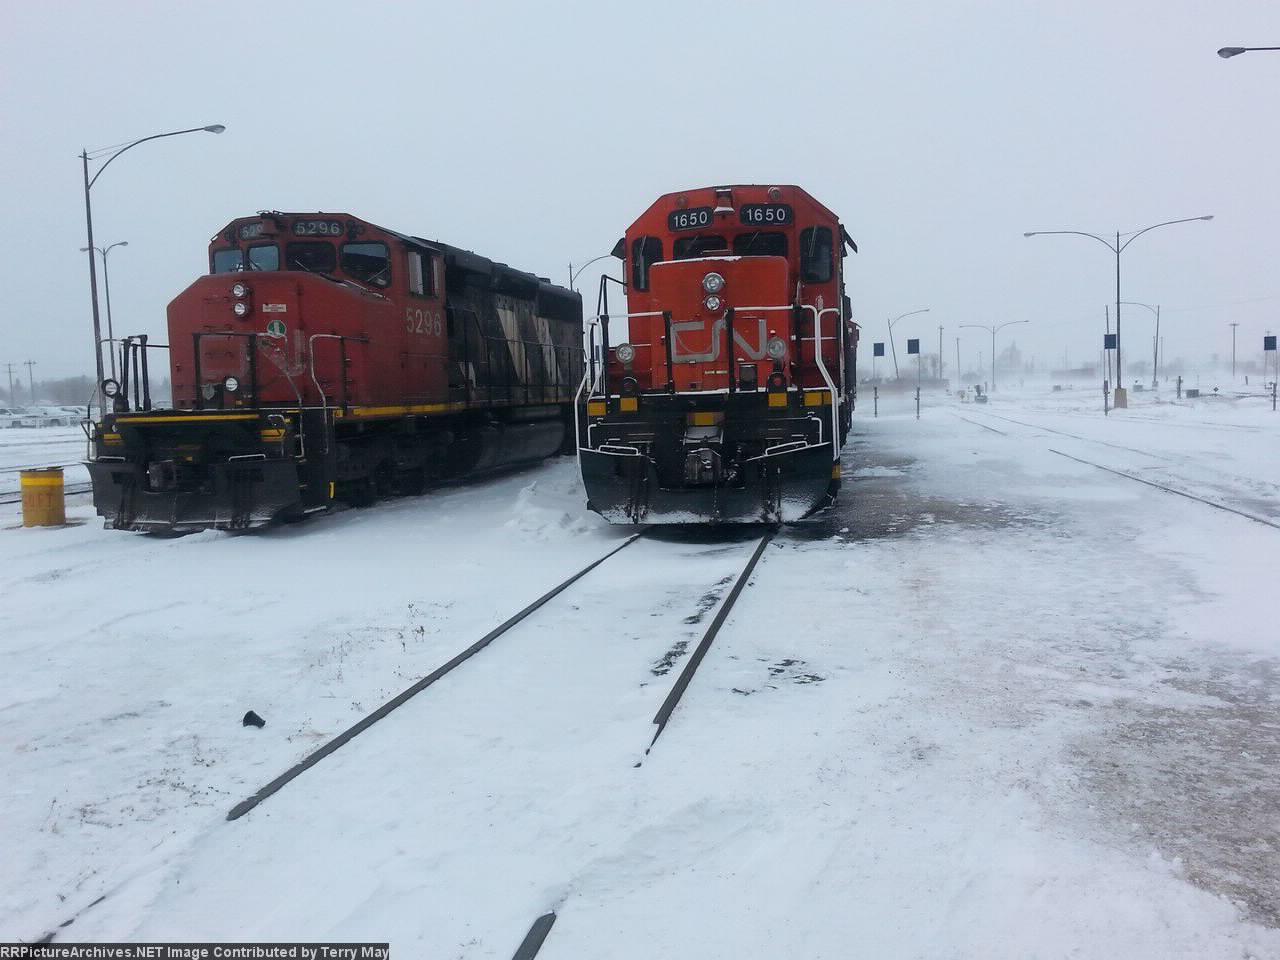 CN 5296 with CN 1650